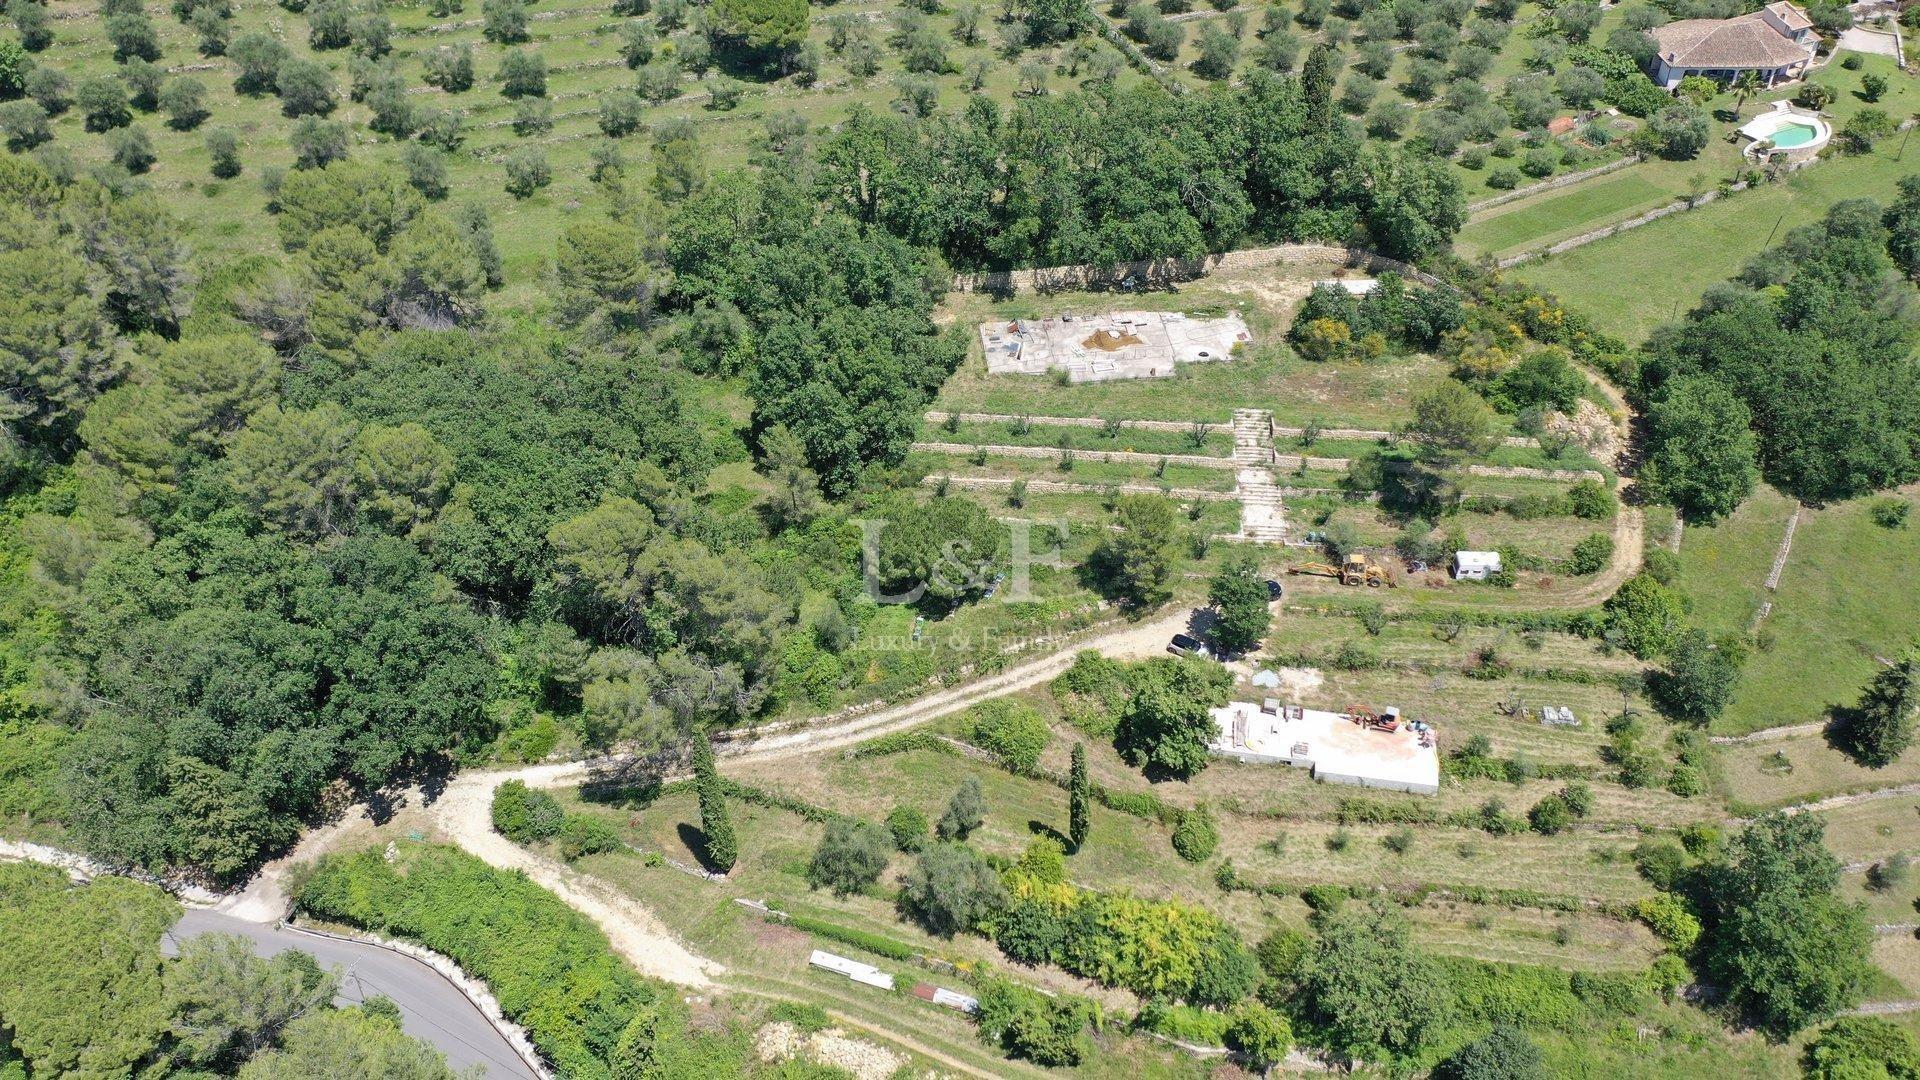 Land in Valbonne, Provence-Alpes-Côte d'Azur, France 1